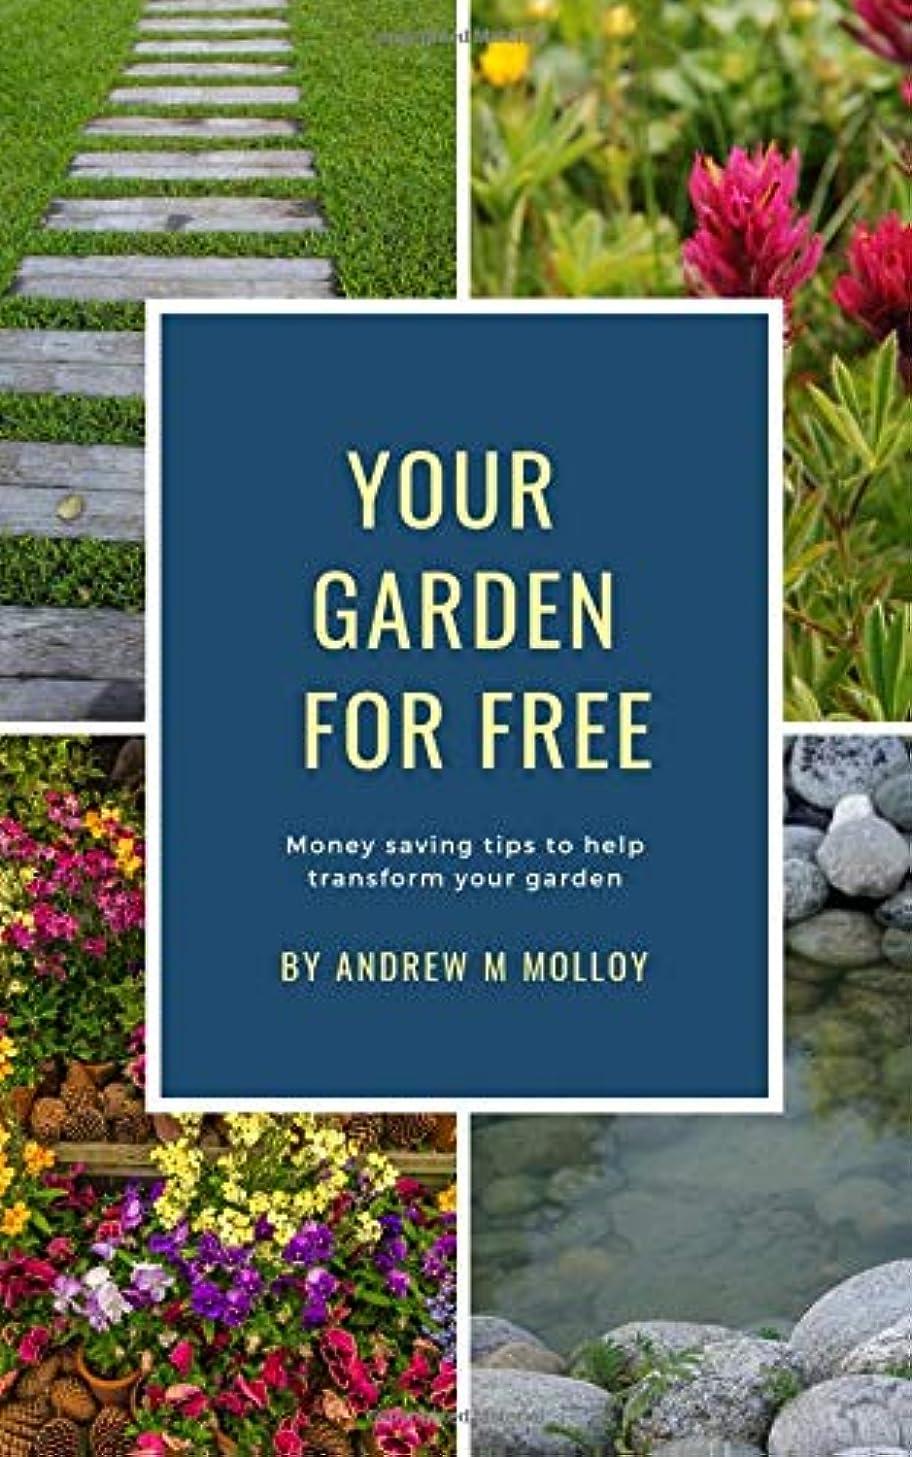 YOUR GARDEN FOR FREE: Money saving tips to help transform your garden